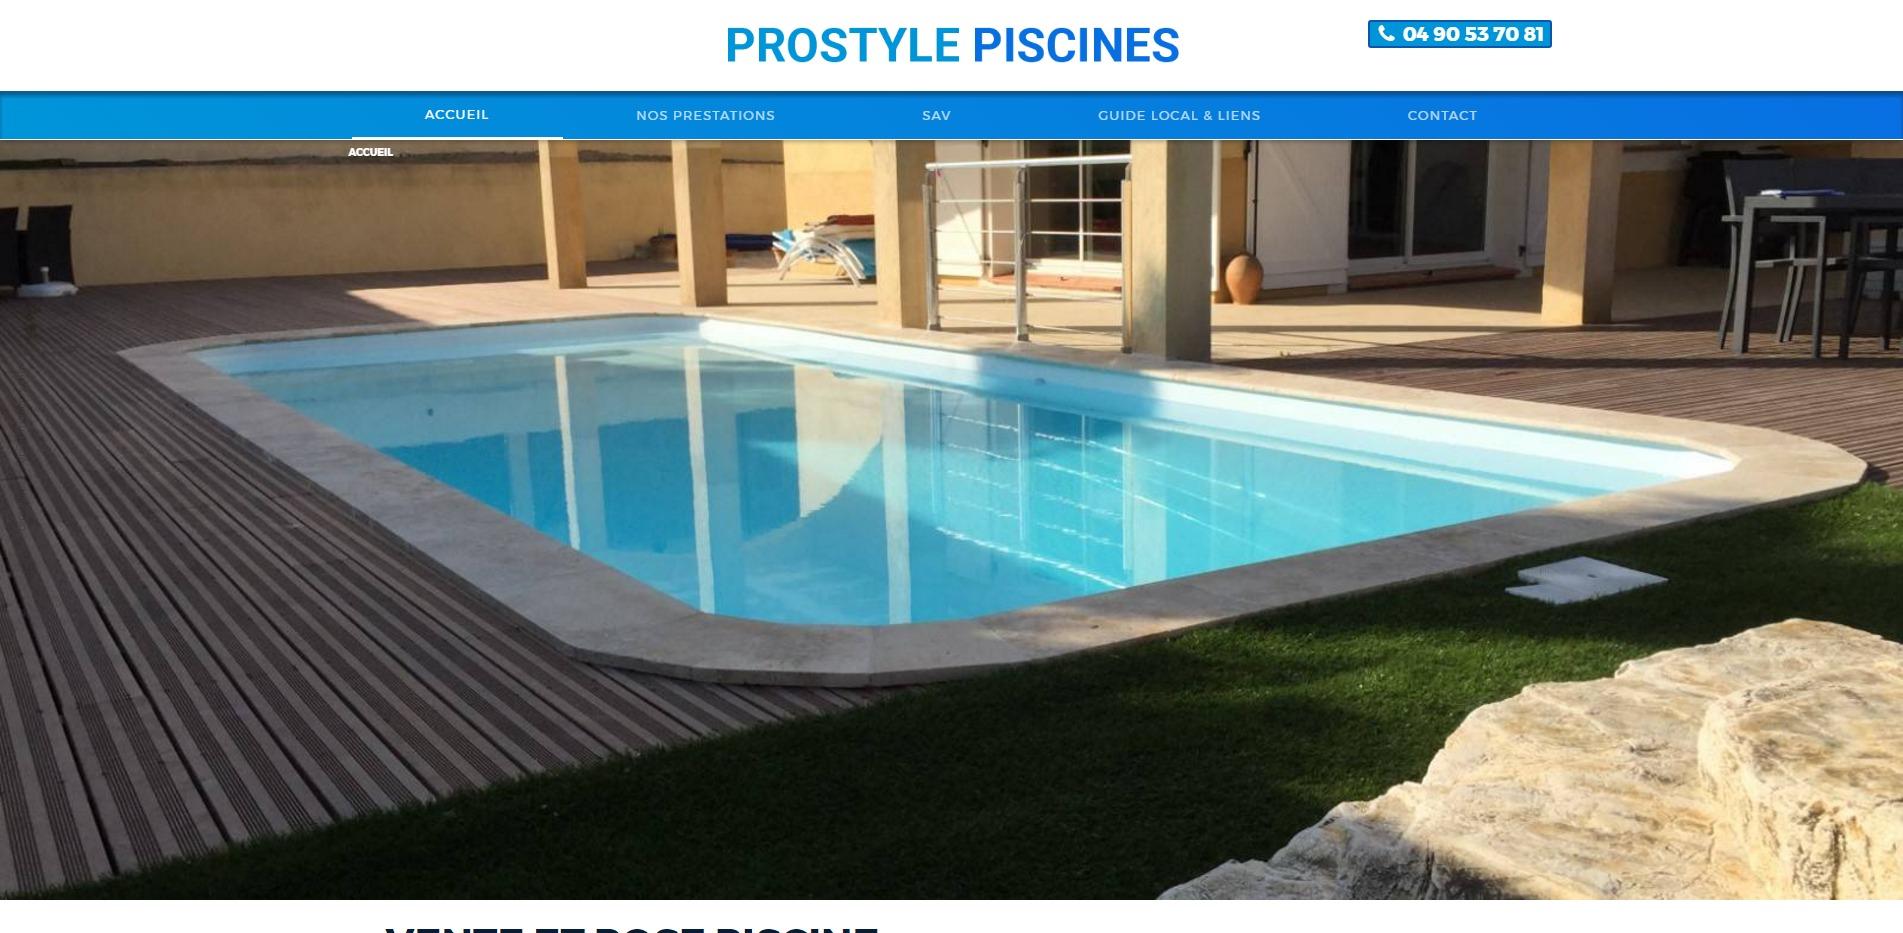 Vente de piscine coque marignane prostyle piscine for Vente de piscine